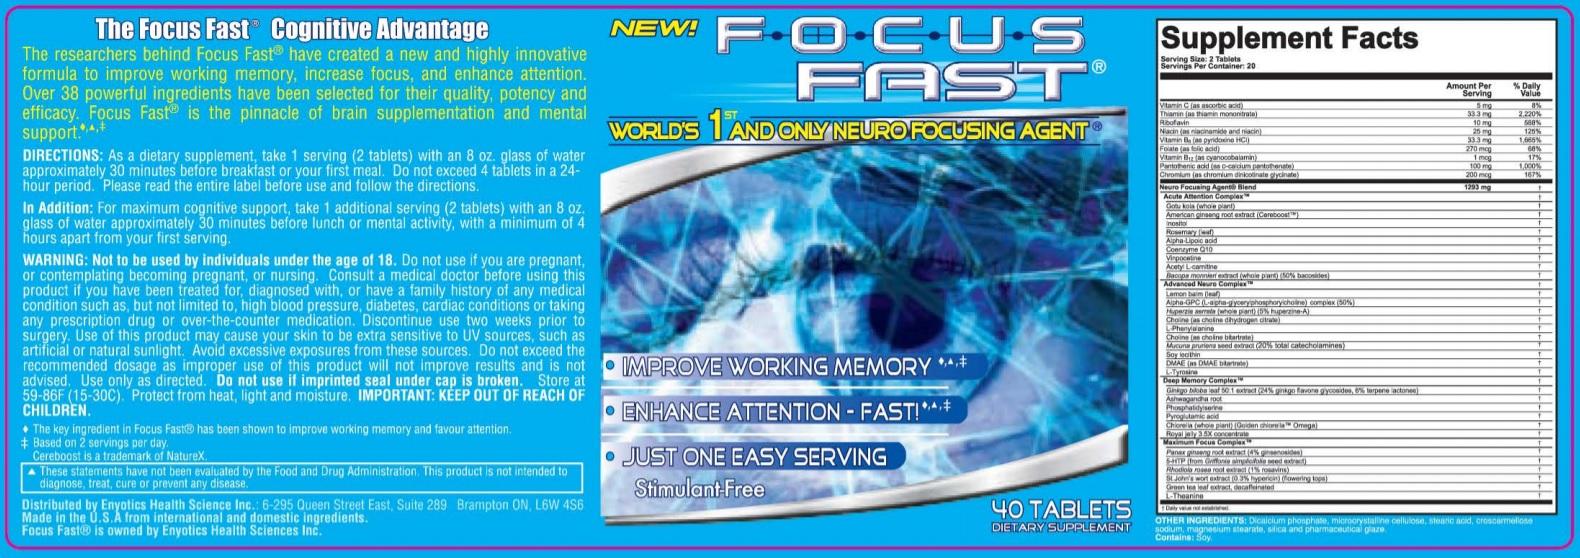 Focus Fast Product Label